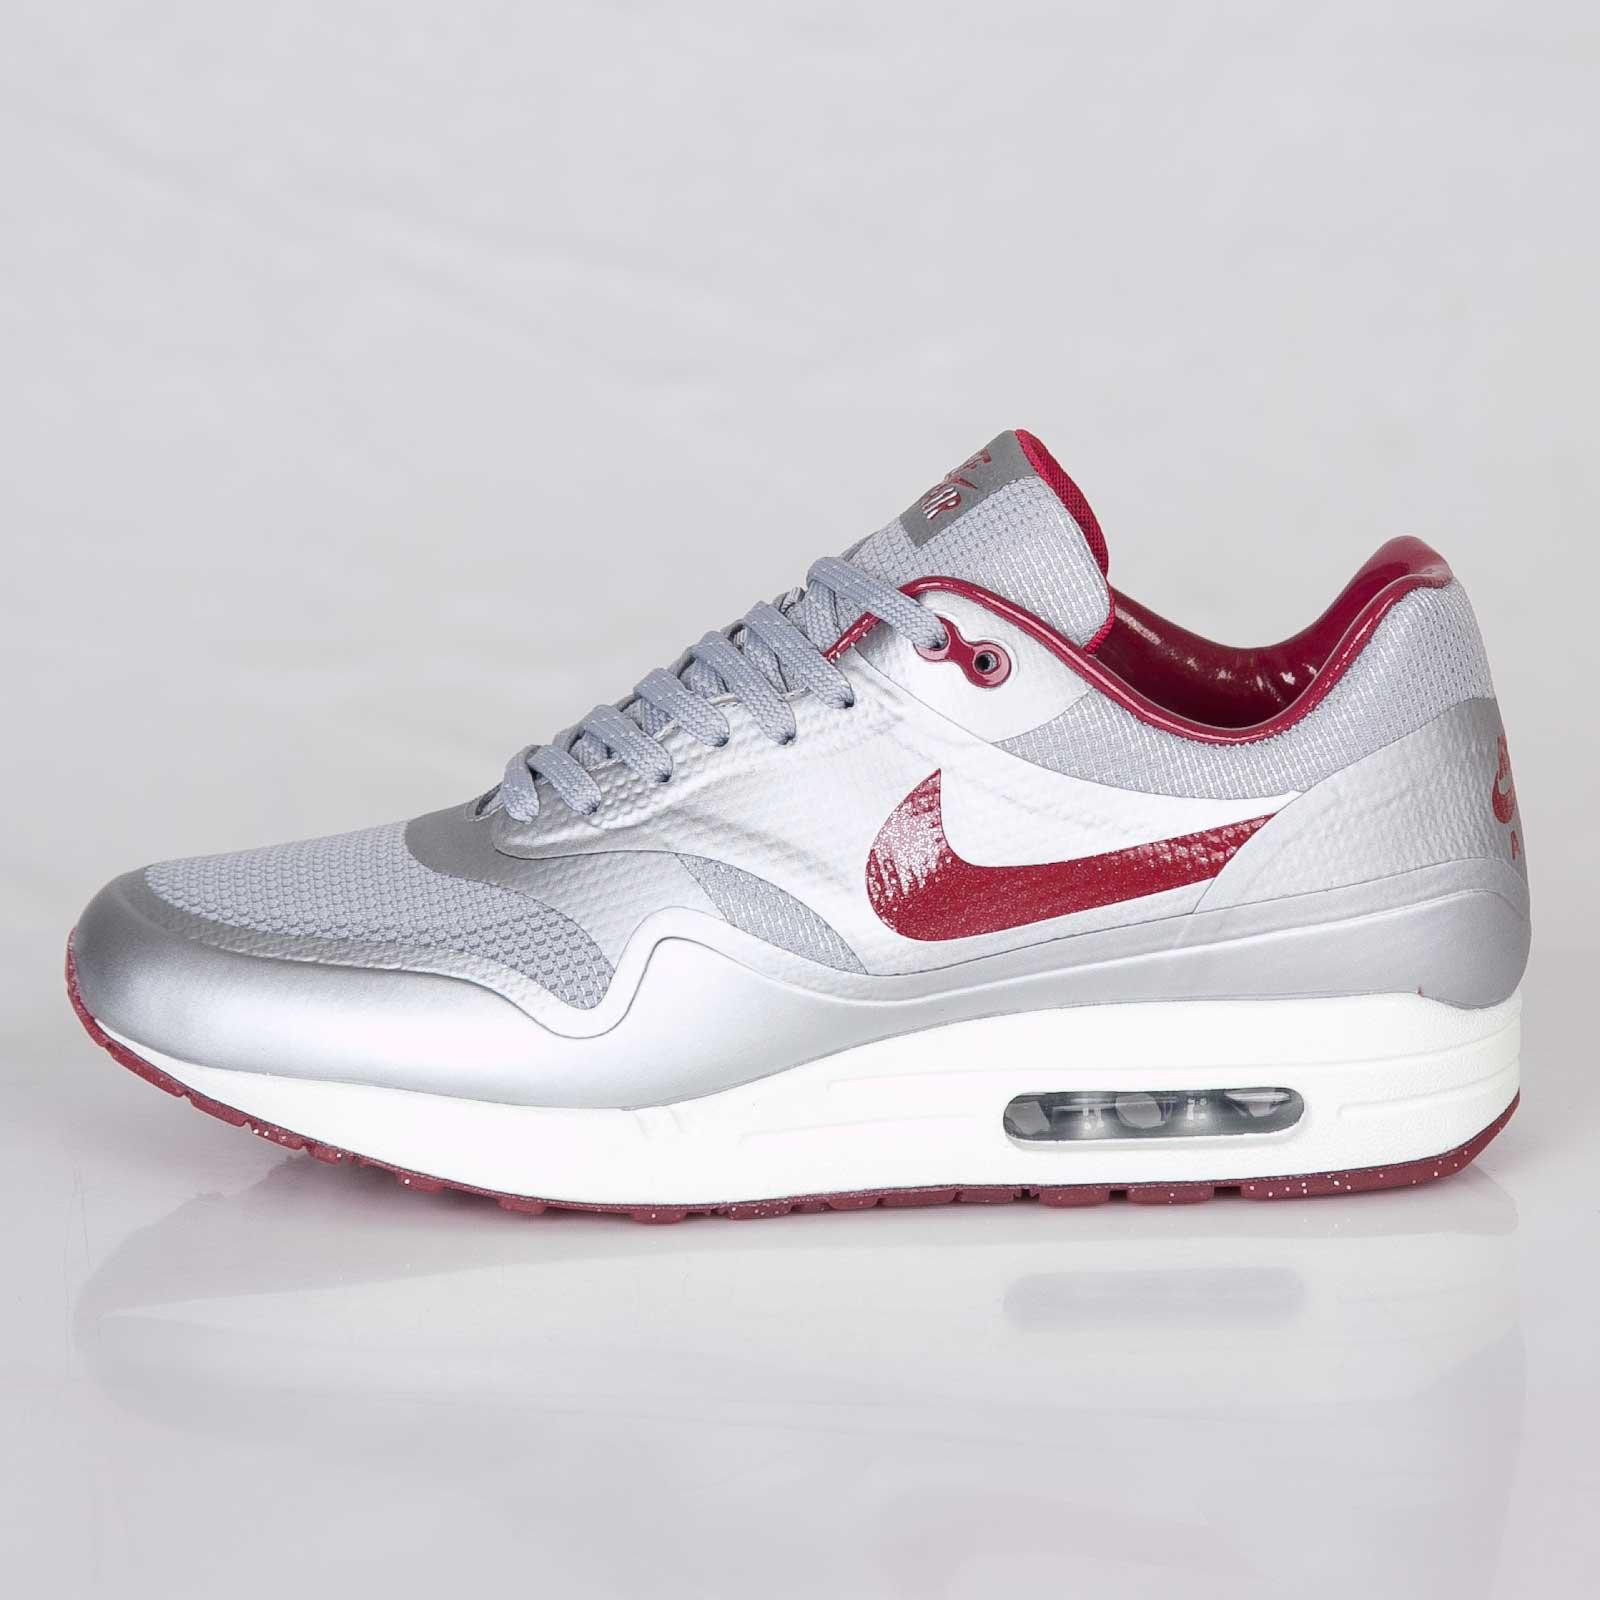 Nike Air Max 90 Ganz Rot Damen waldbroeler